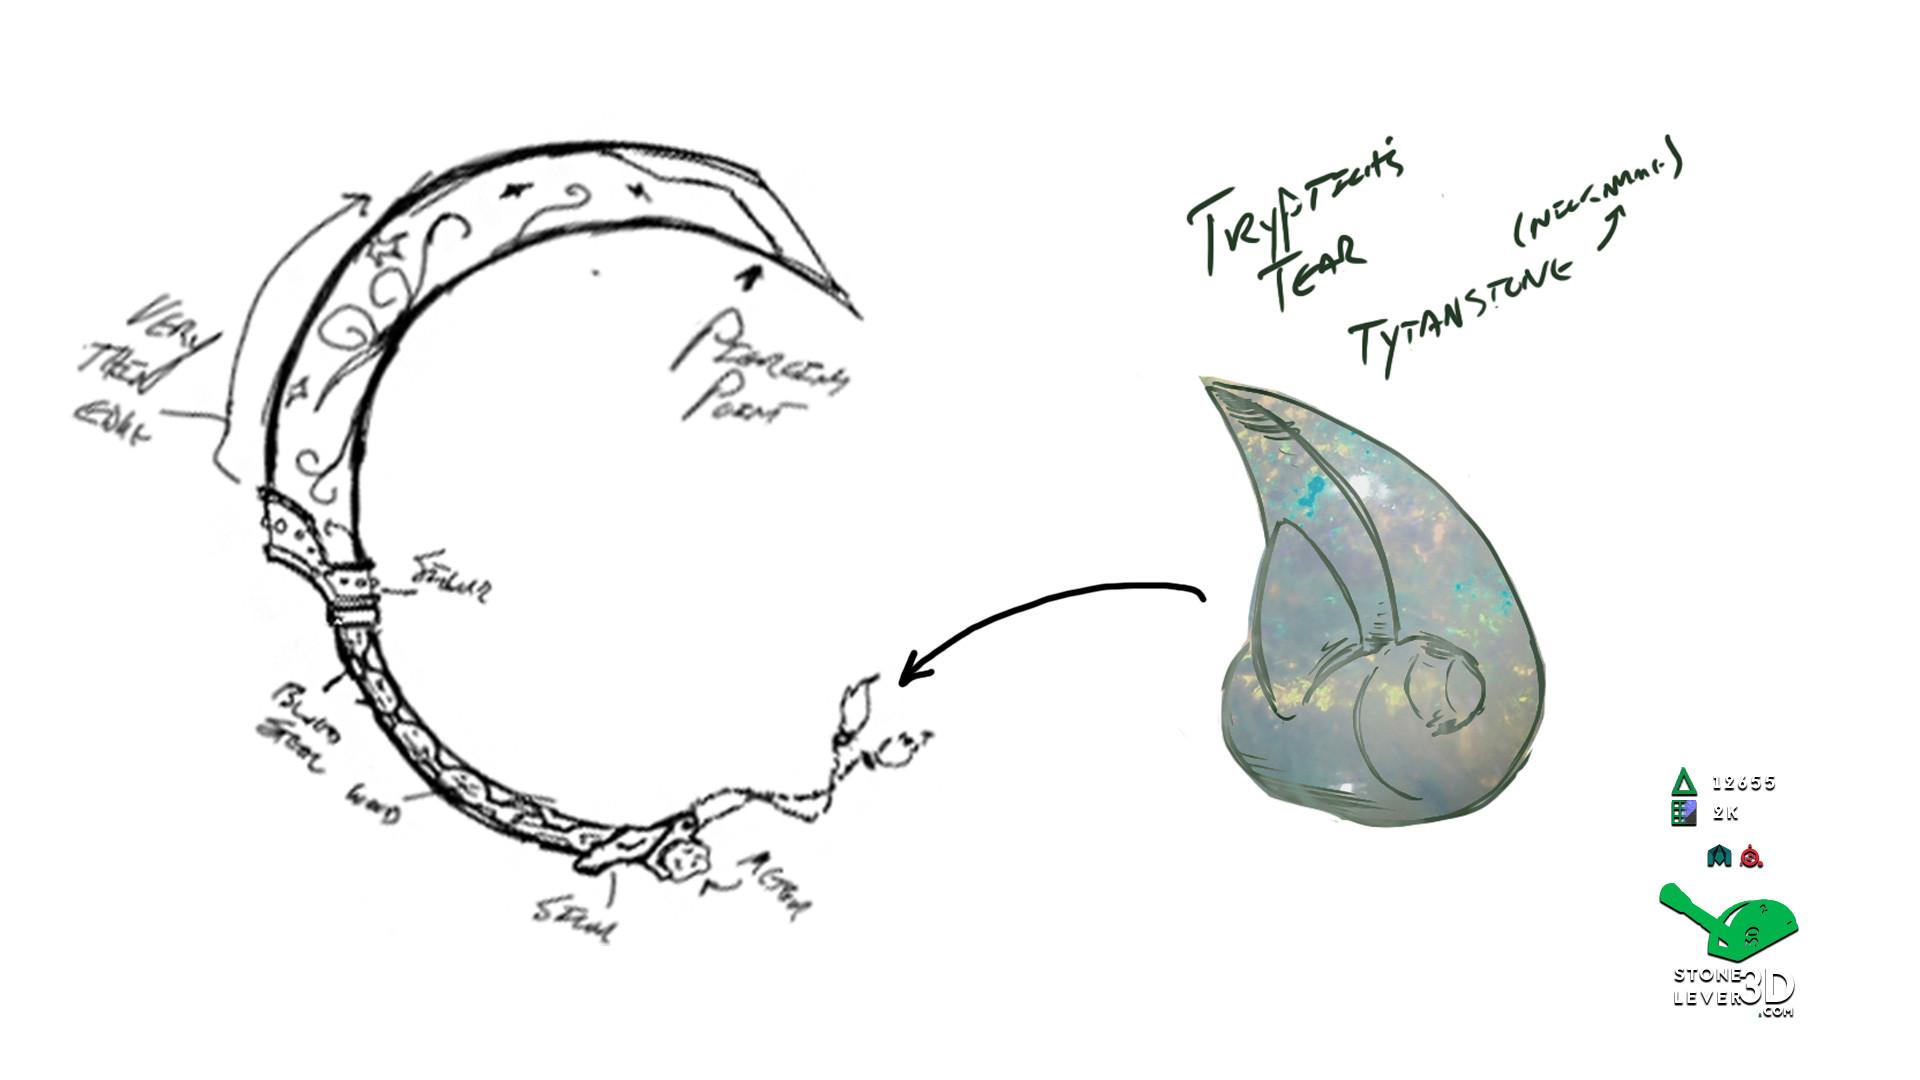 """J'Poki - Novacrusher"" - Sword Concept Prop Model - Concept Sketch"